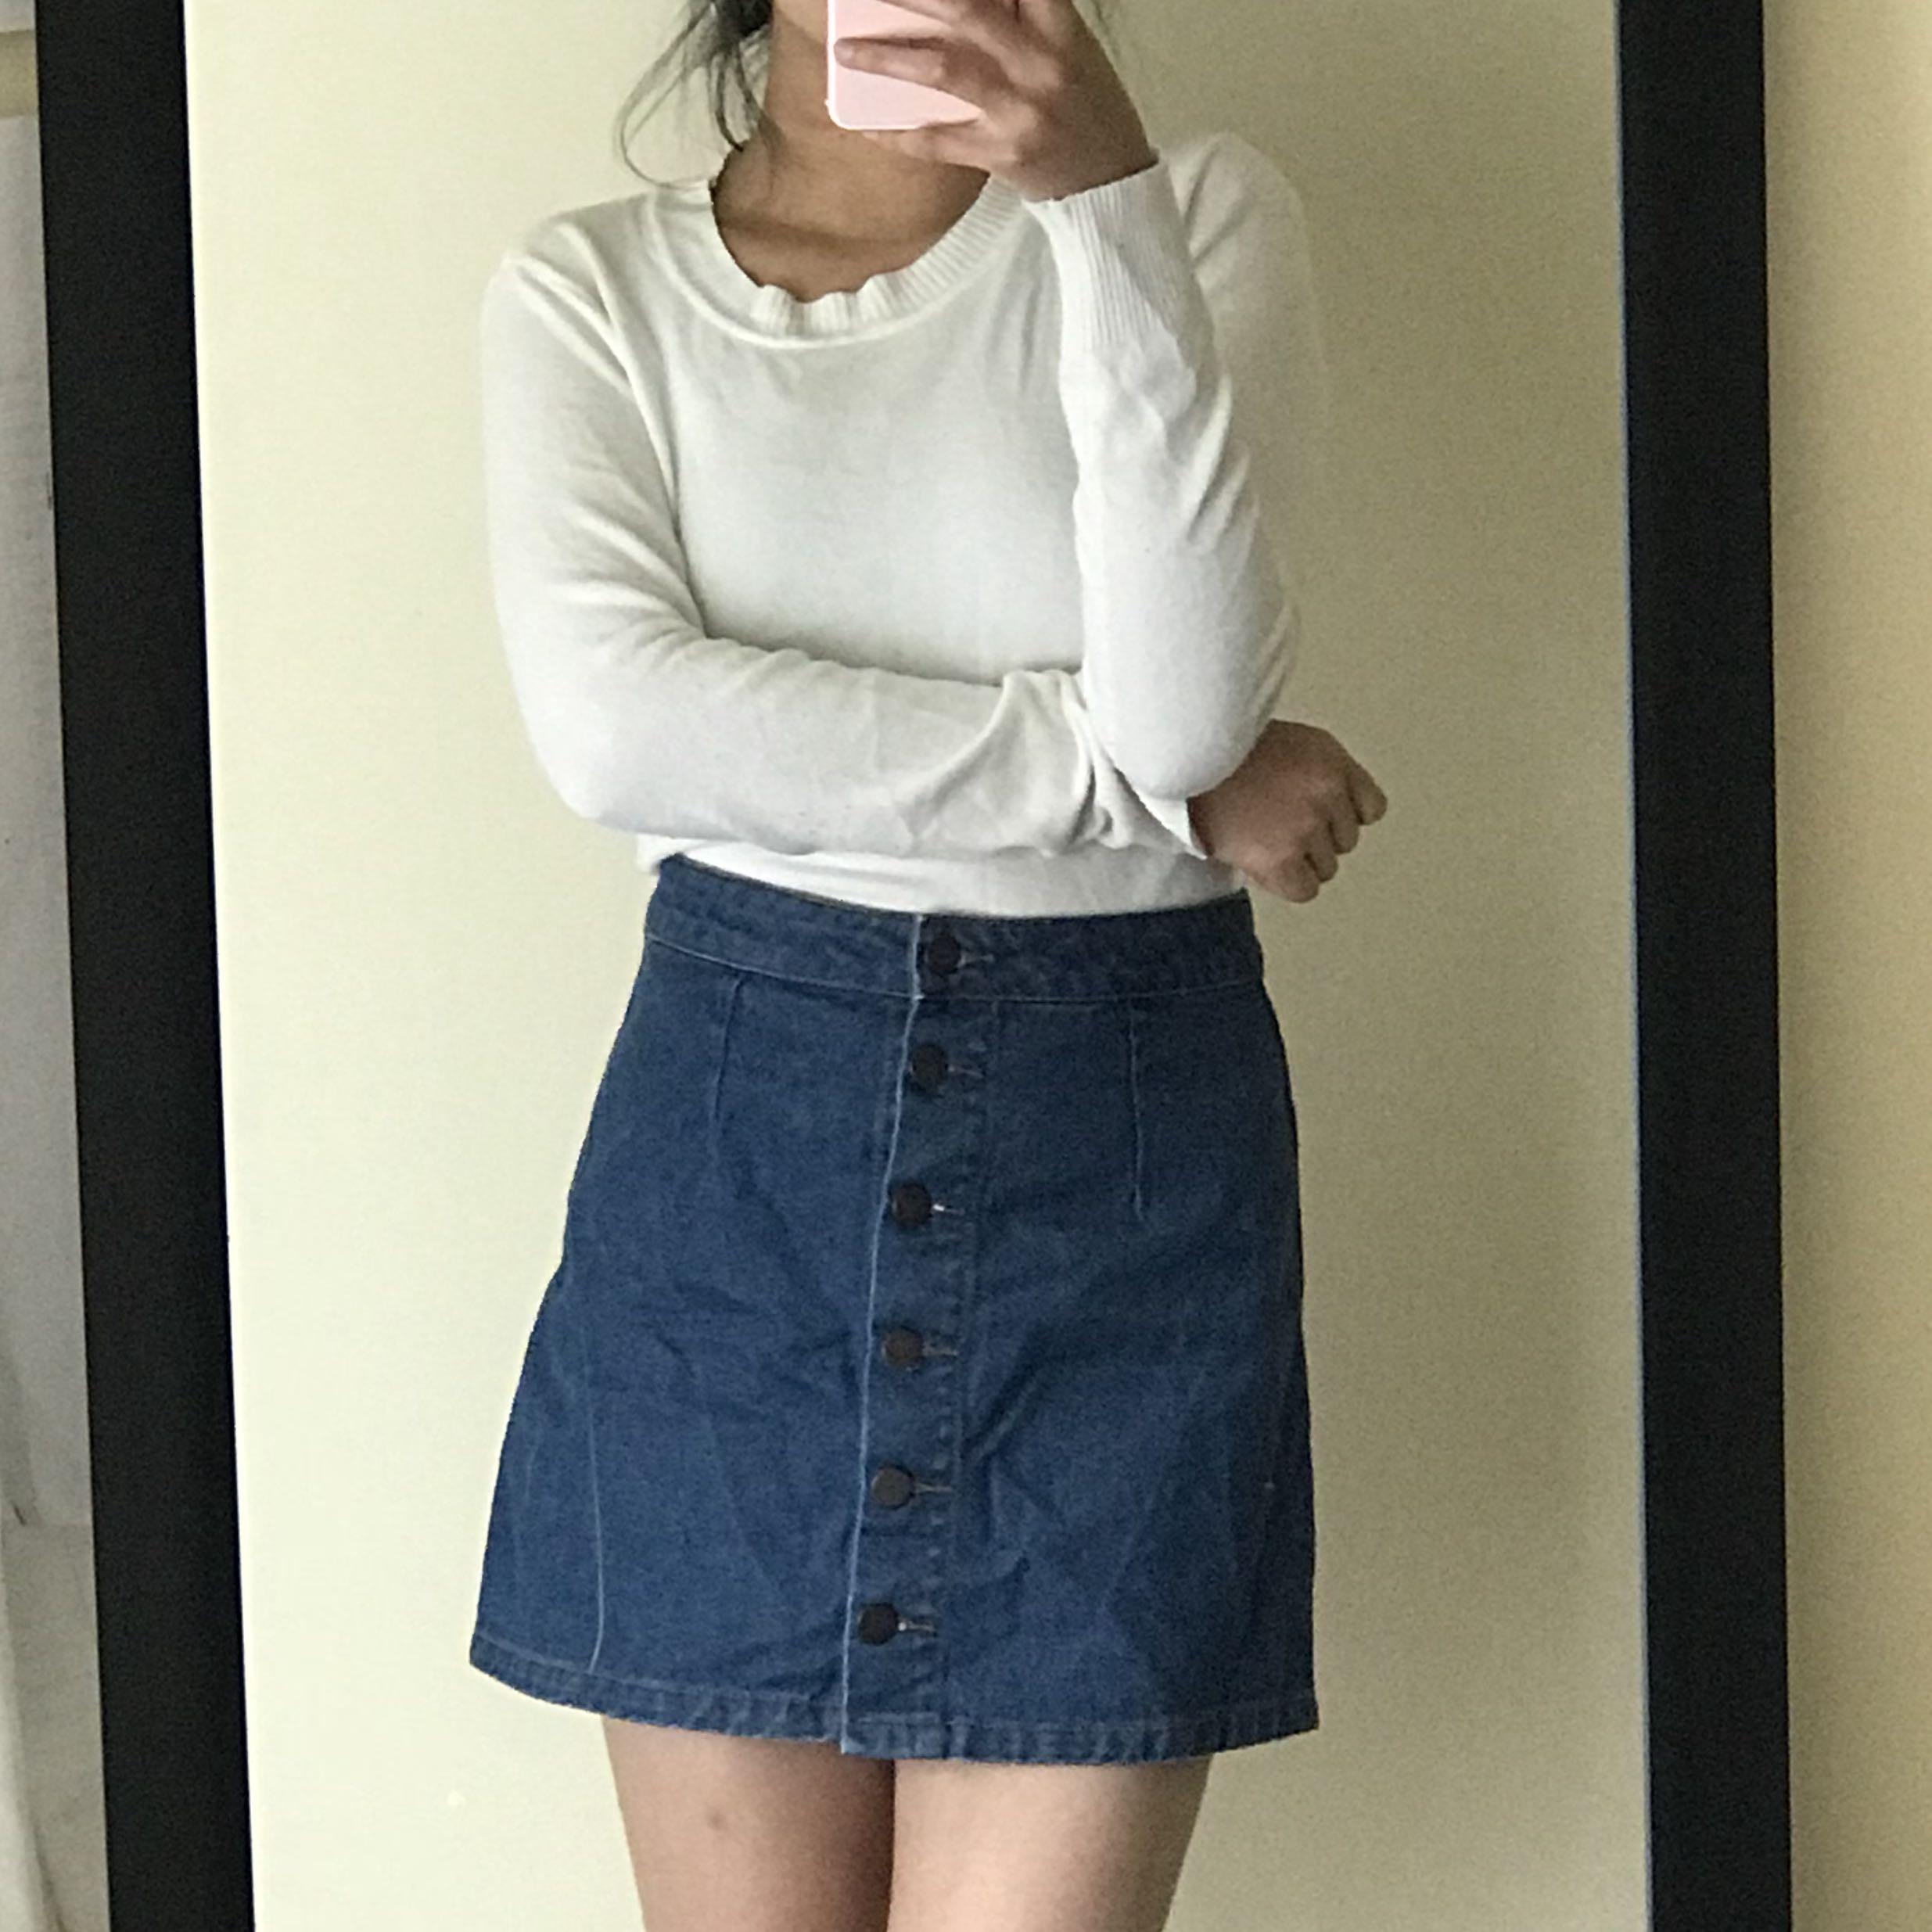 Thin White Knit Sweater